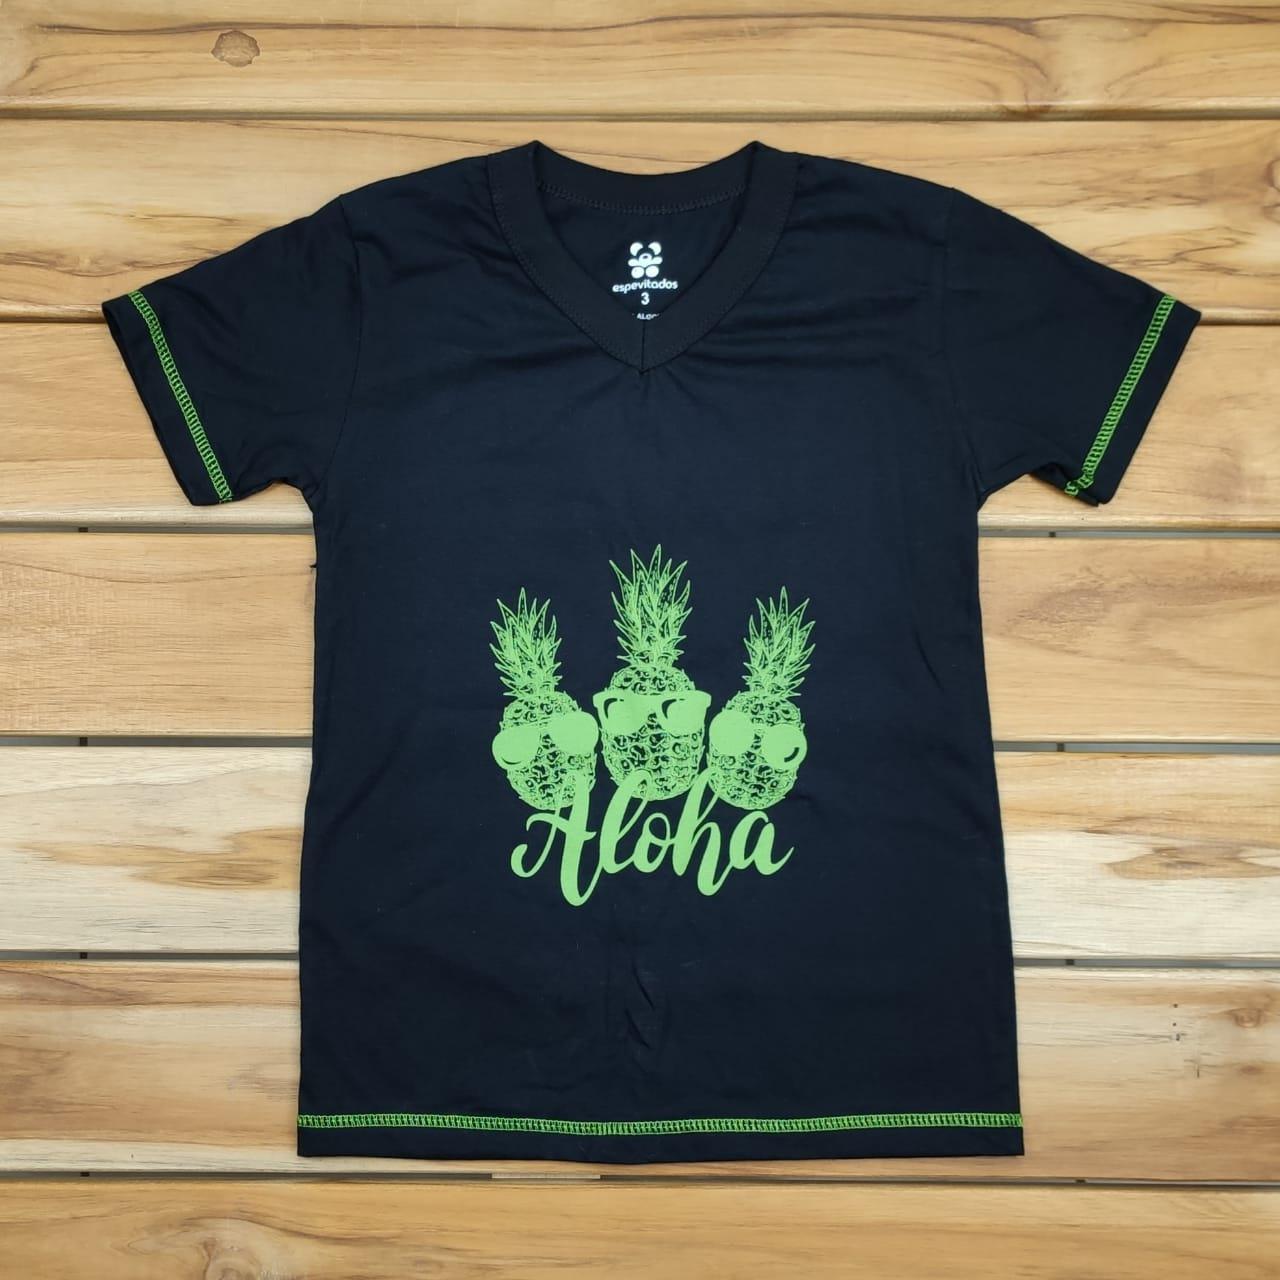 Camiseta Curta Infantil Preta Aloha